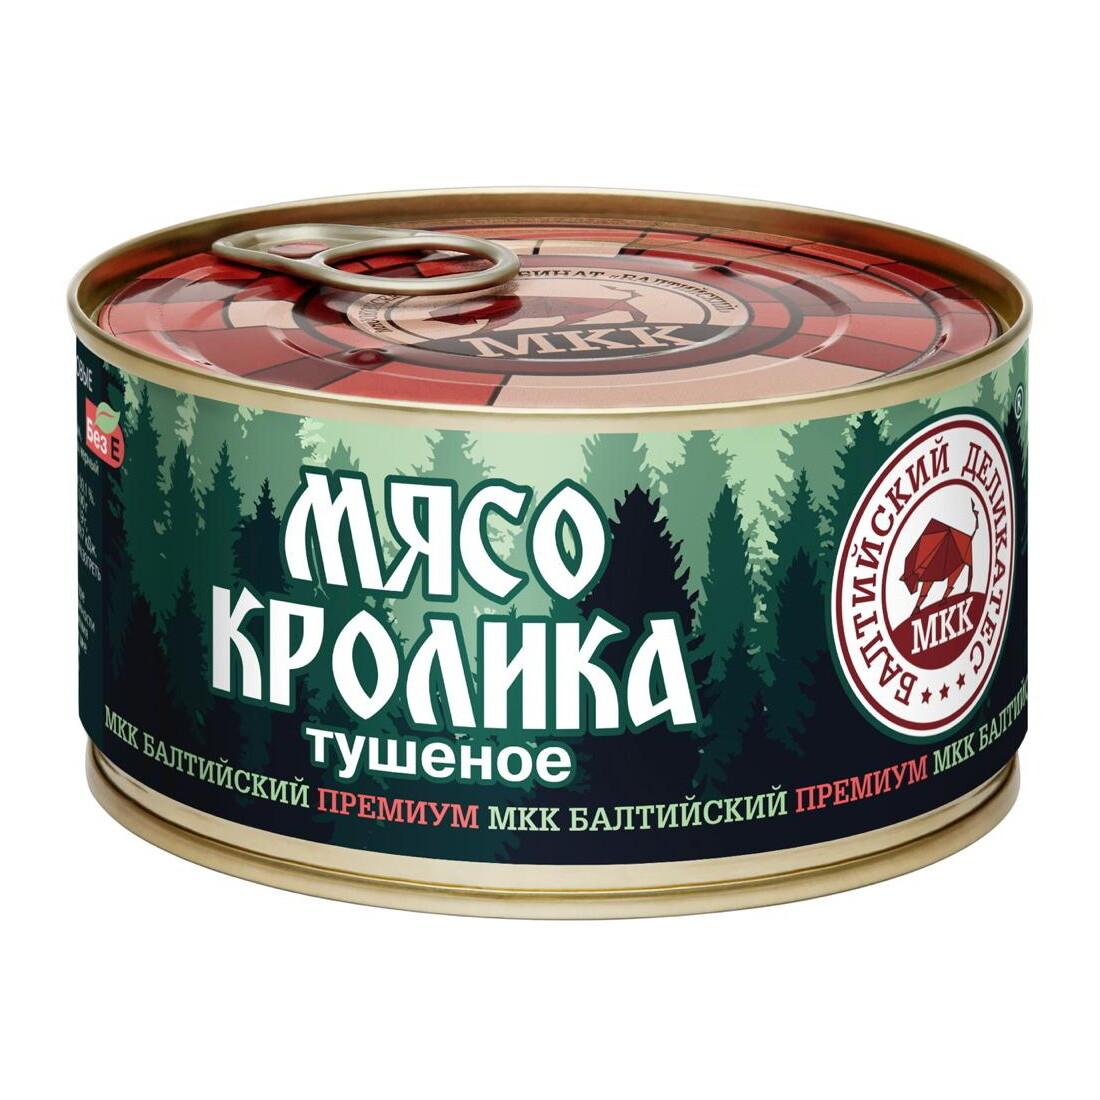 Мясо кролика, Балтийский деликатес, 325 гр